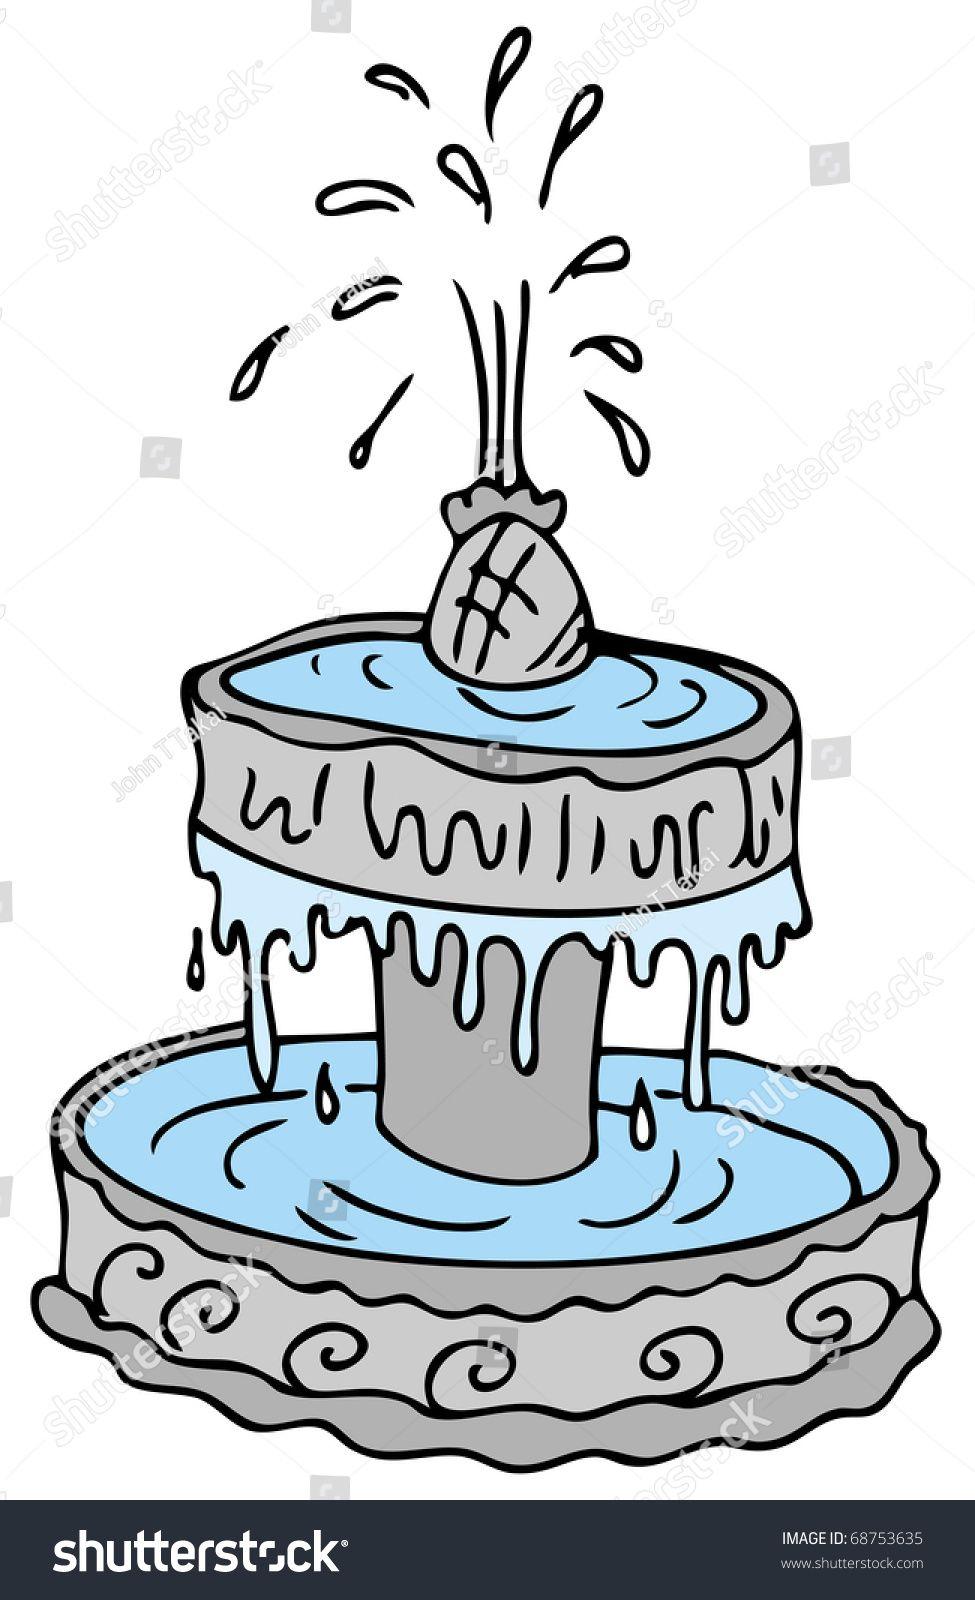 An Image Of A Cartoon Water Fountain Ad Sponsored Cartoon Image Fountain Water In 2021 Water Fountain Cartoon Fountain